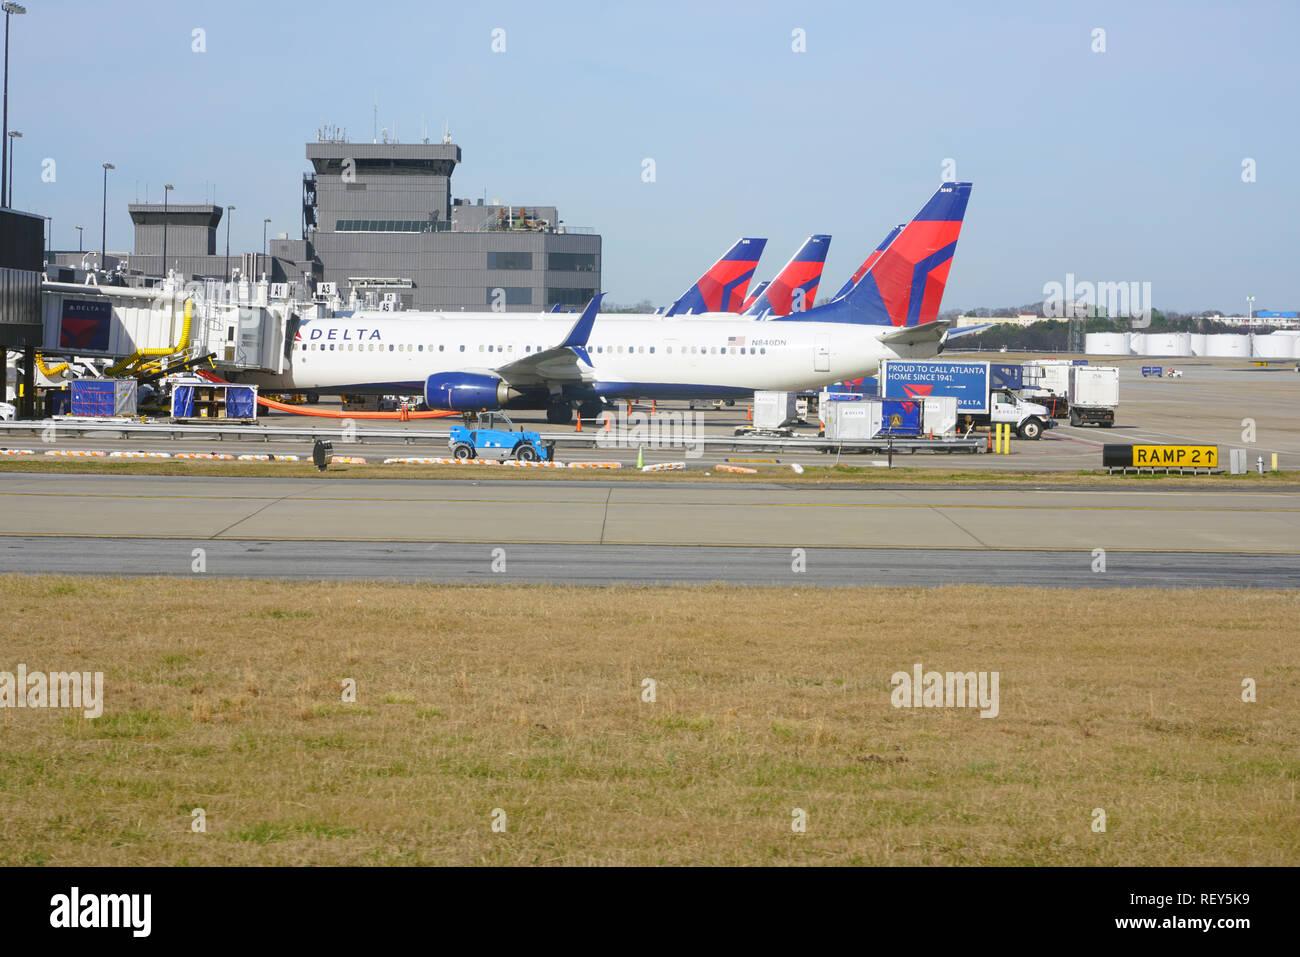 ATLANTA, GA -7 JAN 2019-  View of airplanes from Delta Airlines (DL) at the Hartsfield–Jackson Atlanta International Airport (ATL), a hub for Delta. - Stock Image